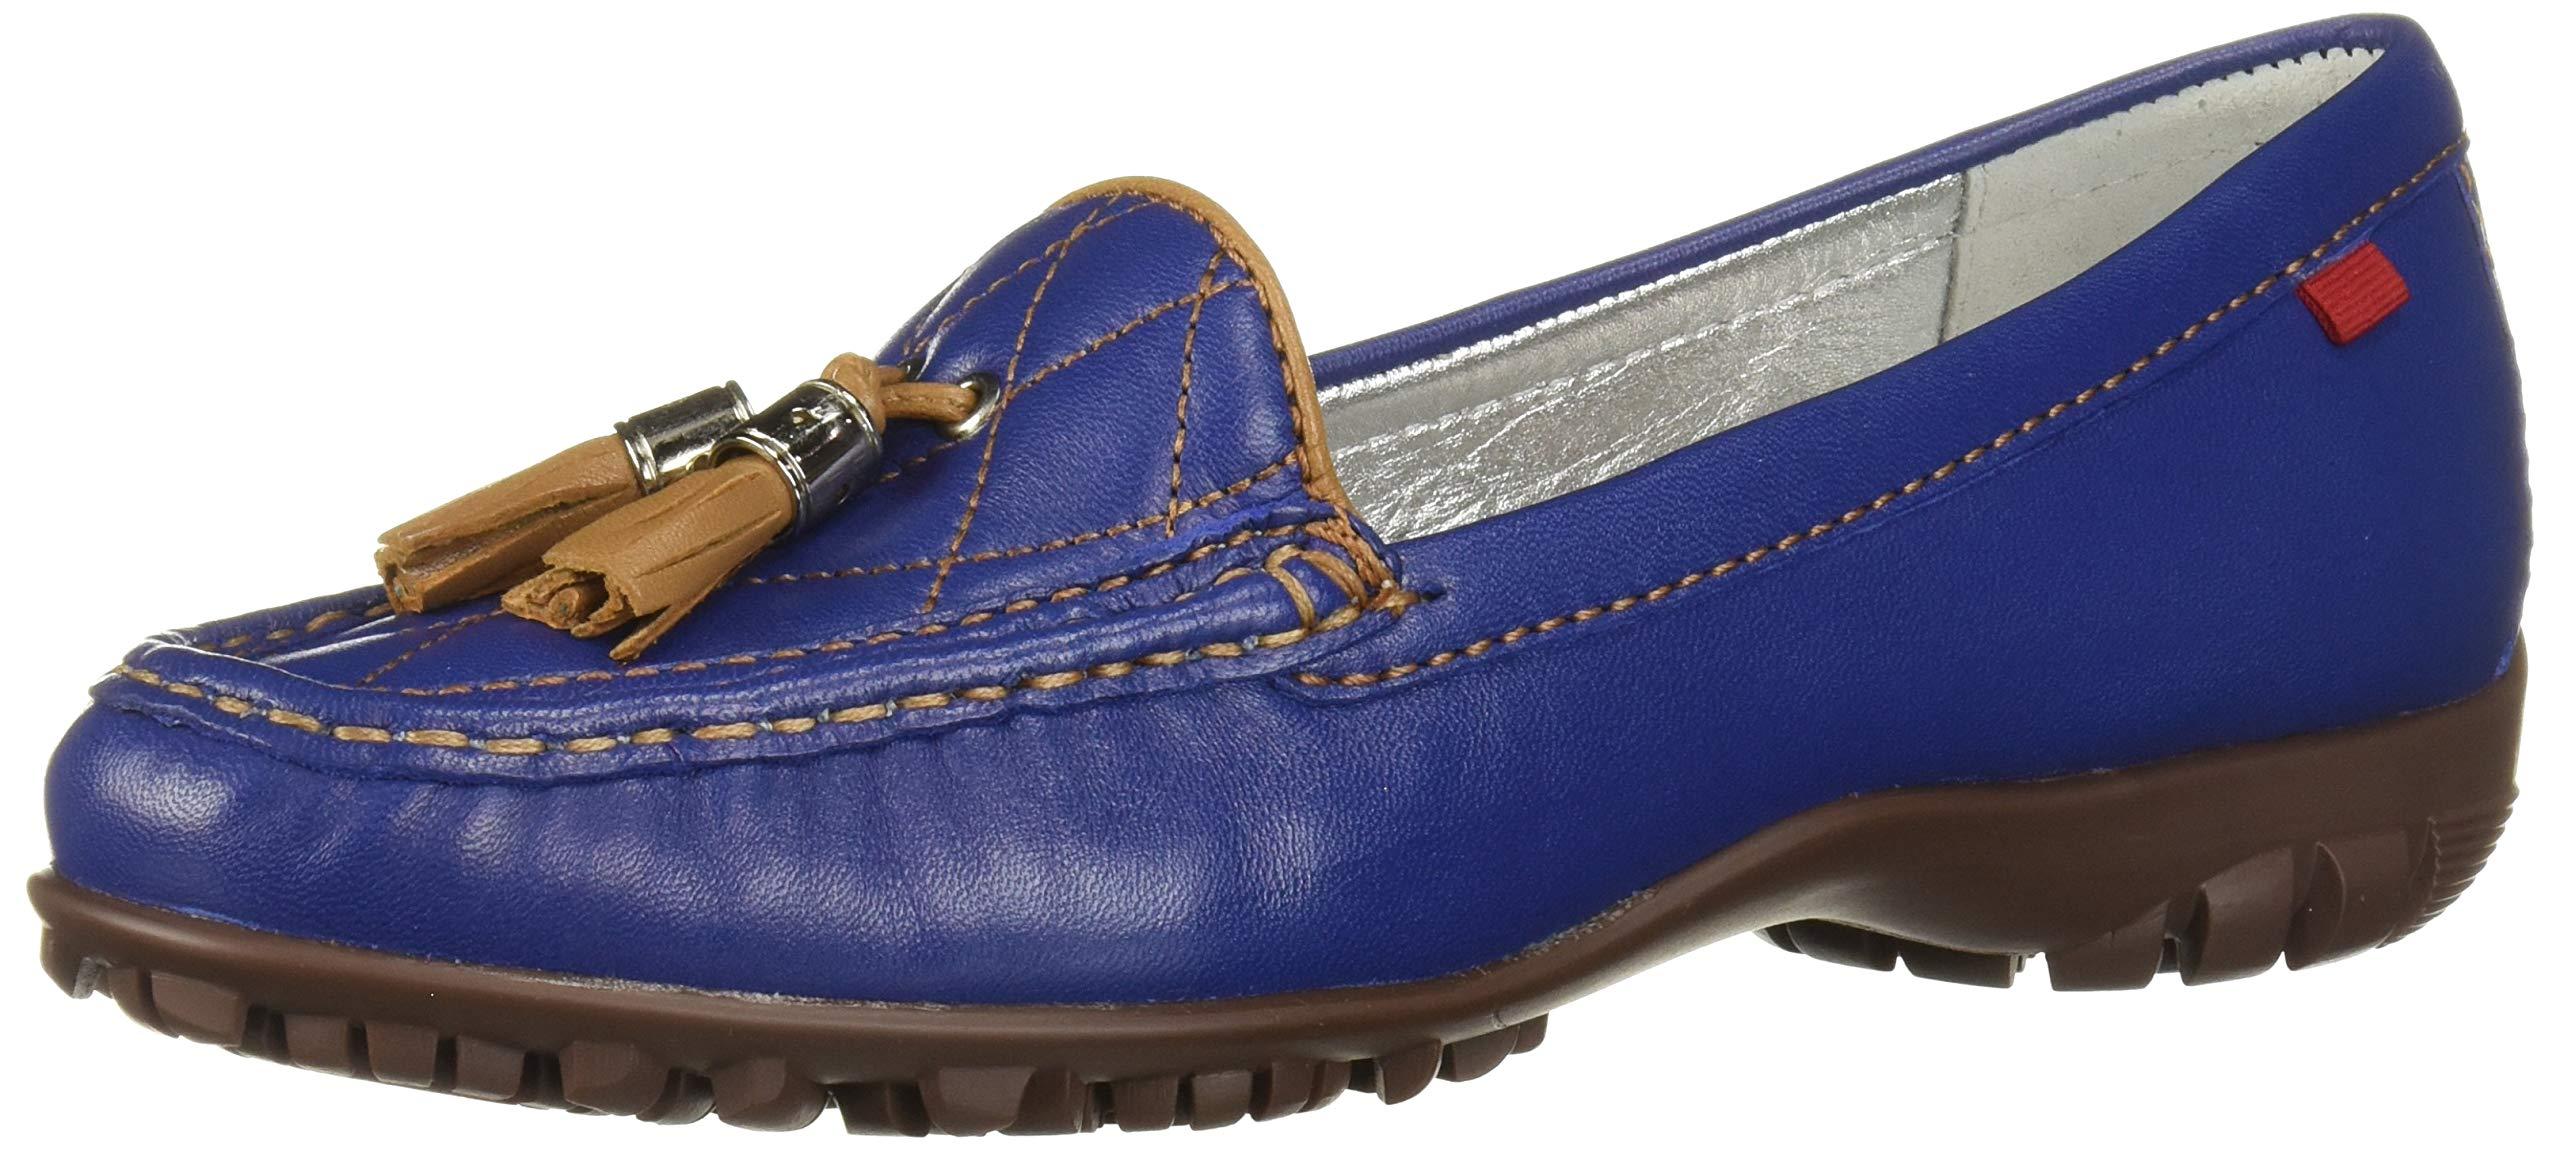 Marc Joseph New York Women's Womens Genuine Leather Made in Brazil Wall Street Golf Shoe Athletic Shoe, Vintage blue nappa/Tan, 9 M US by MARC JOSEPH NEW YORK